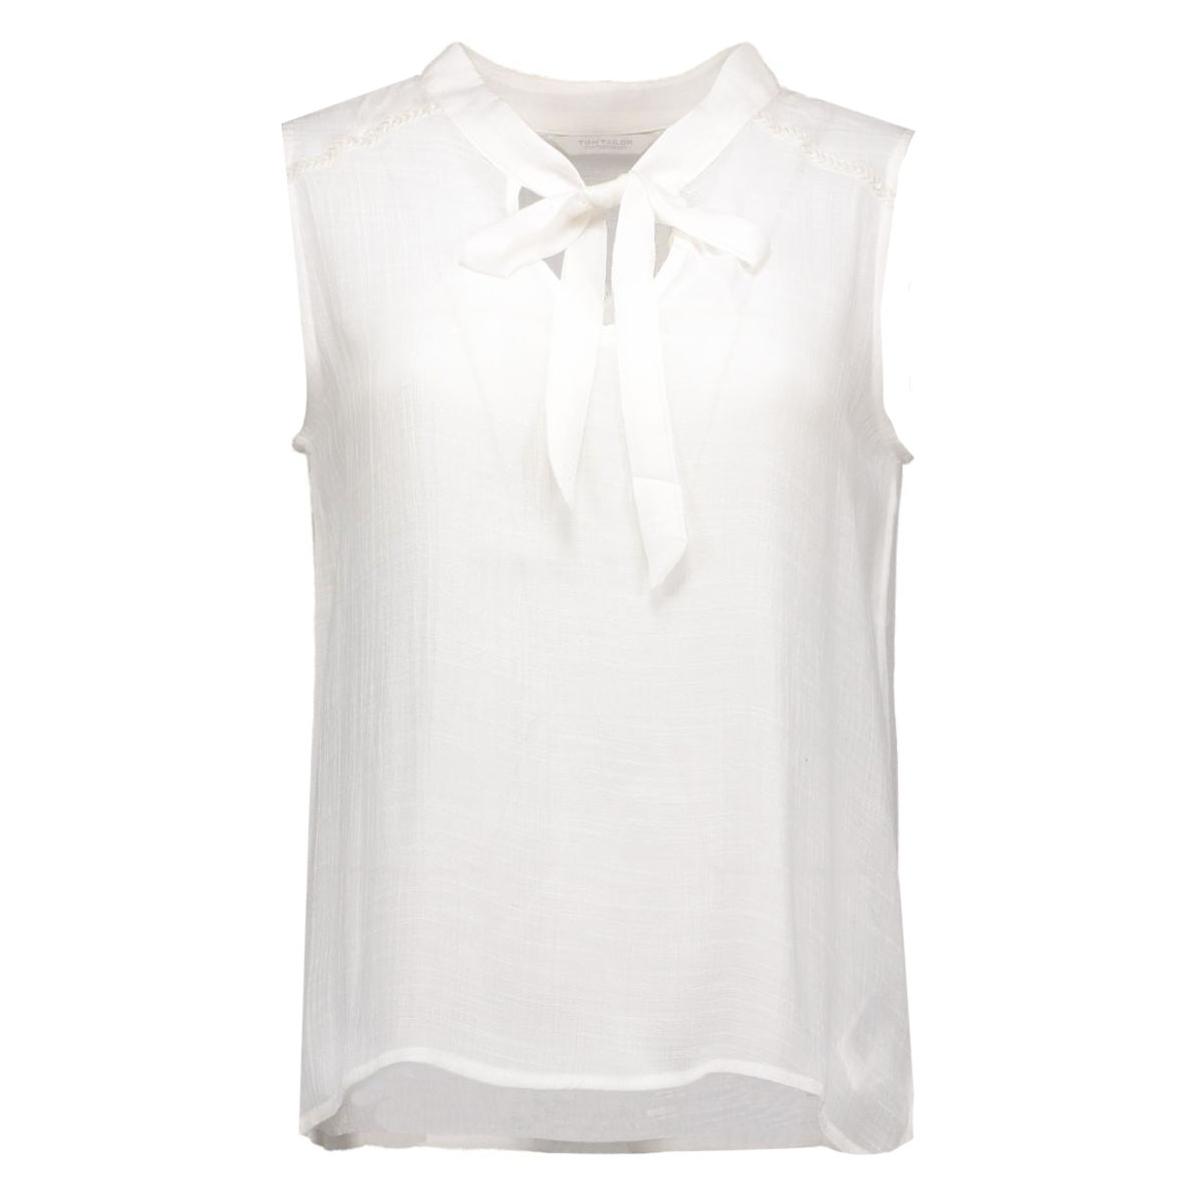 2032091.00.75 tom tailor top 8210